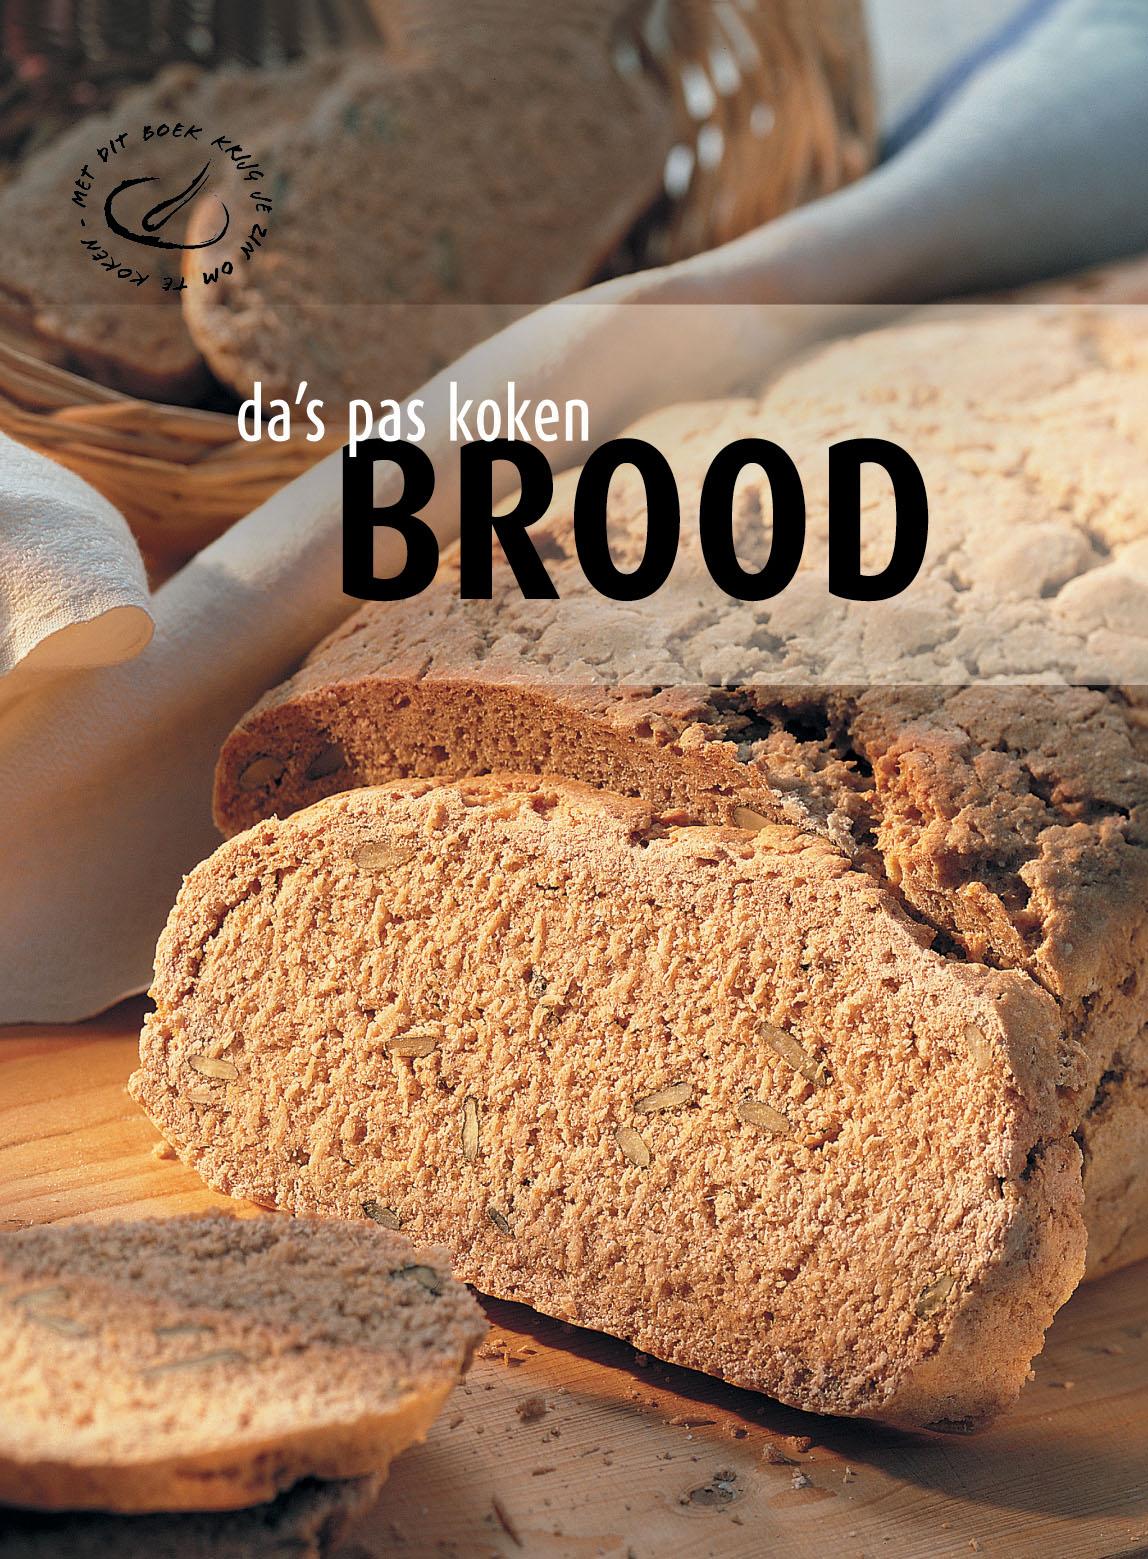 Brood - da's pas koken